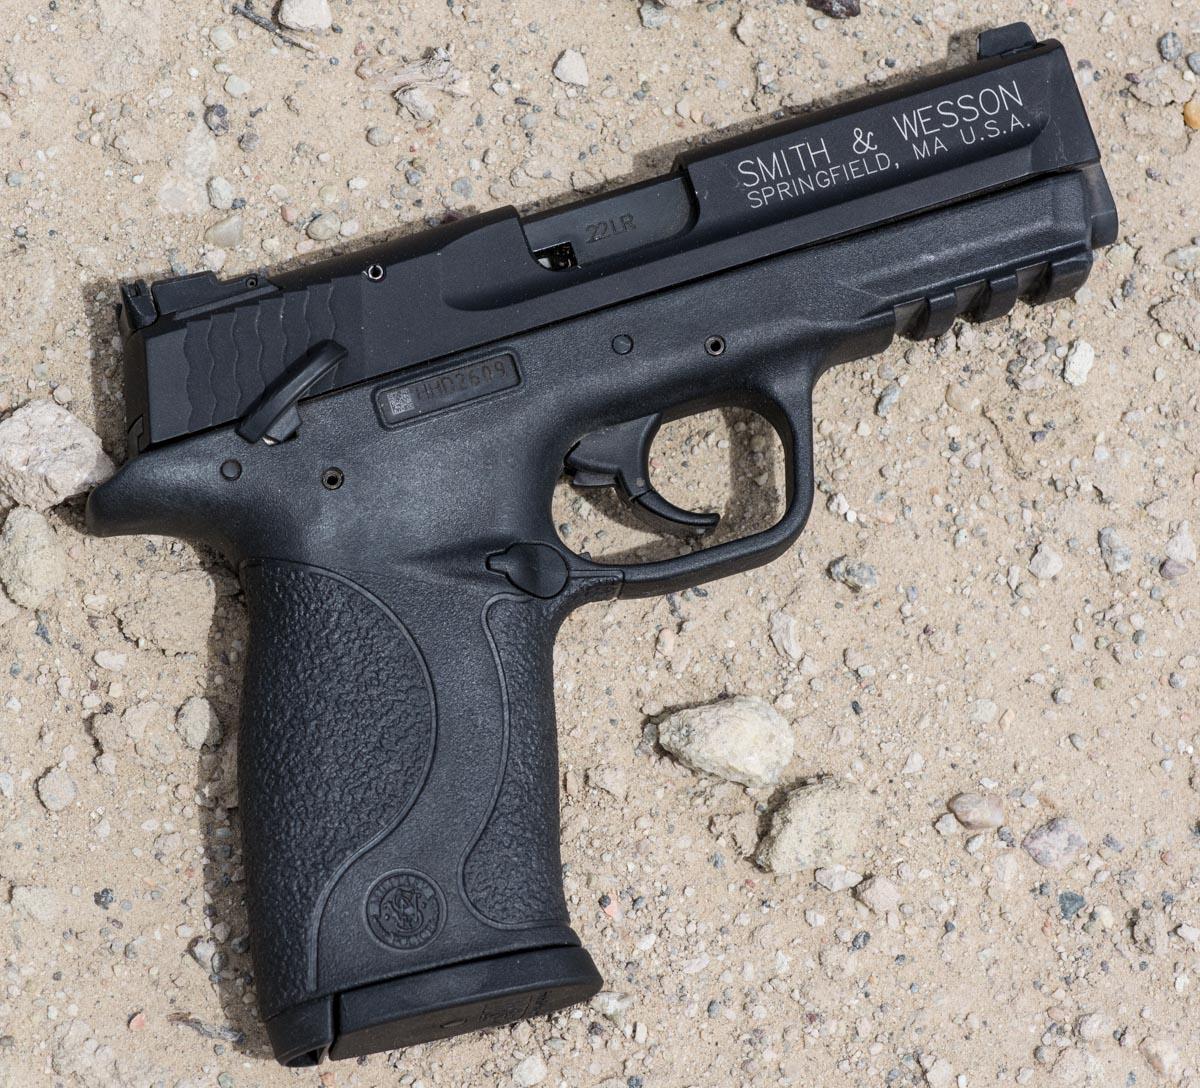 smith & wesson 22 pistols